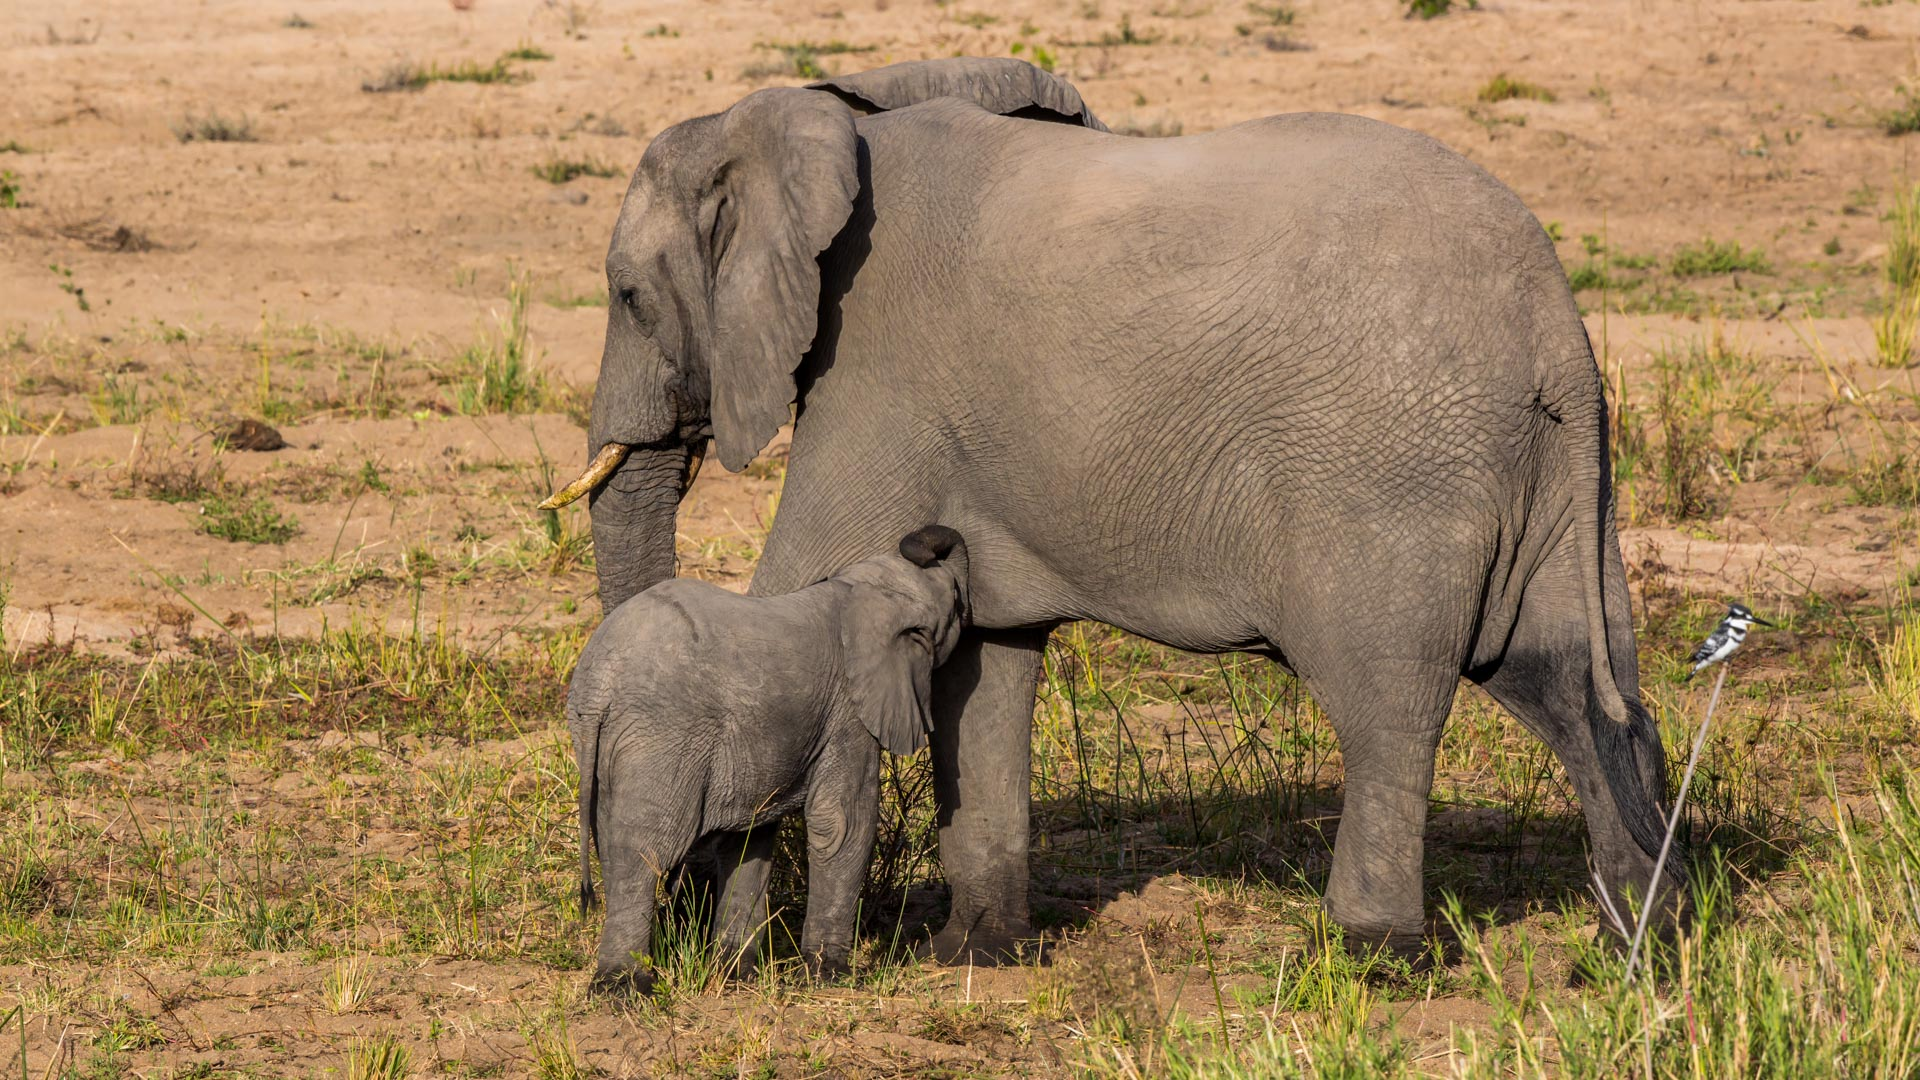 malamala elephants South Africa